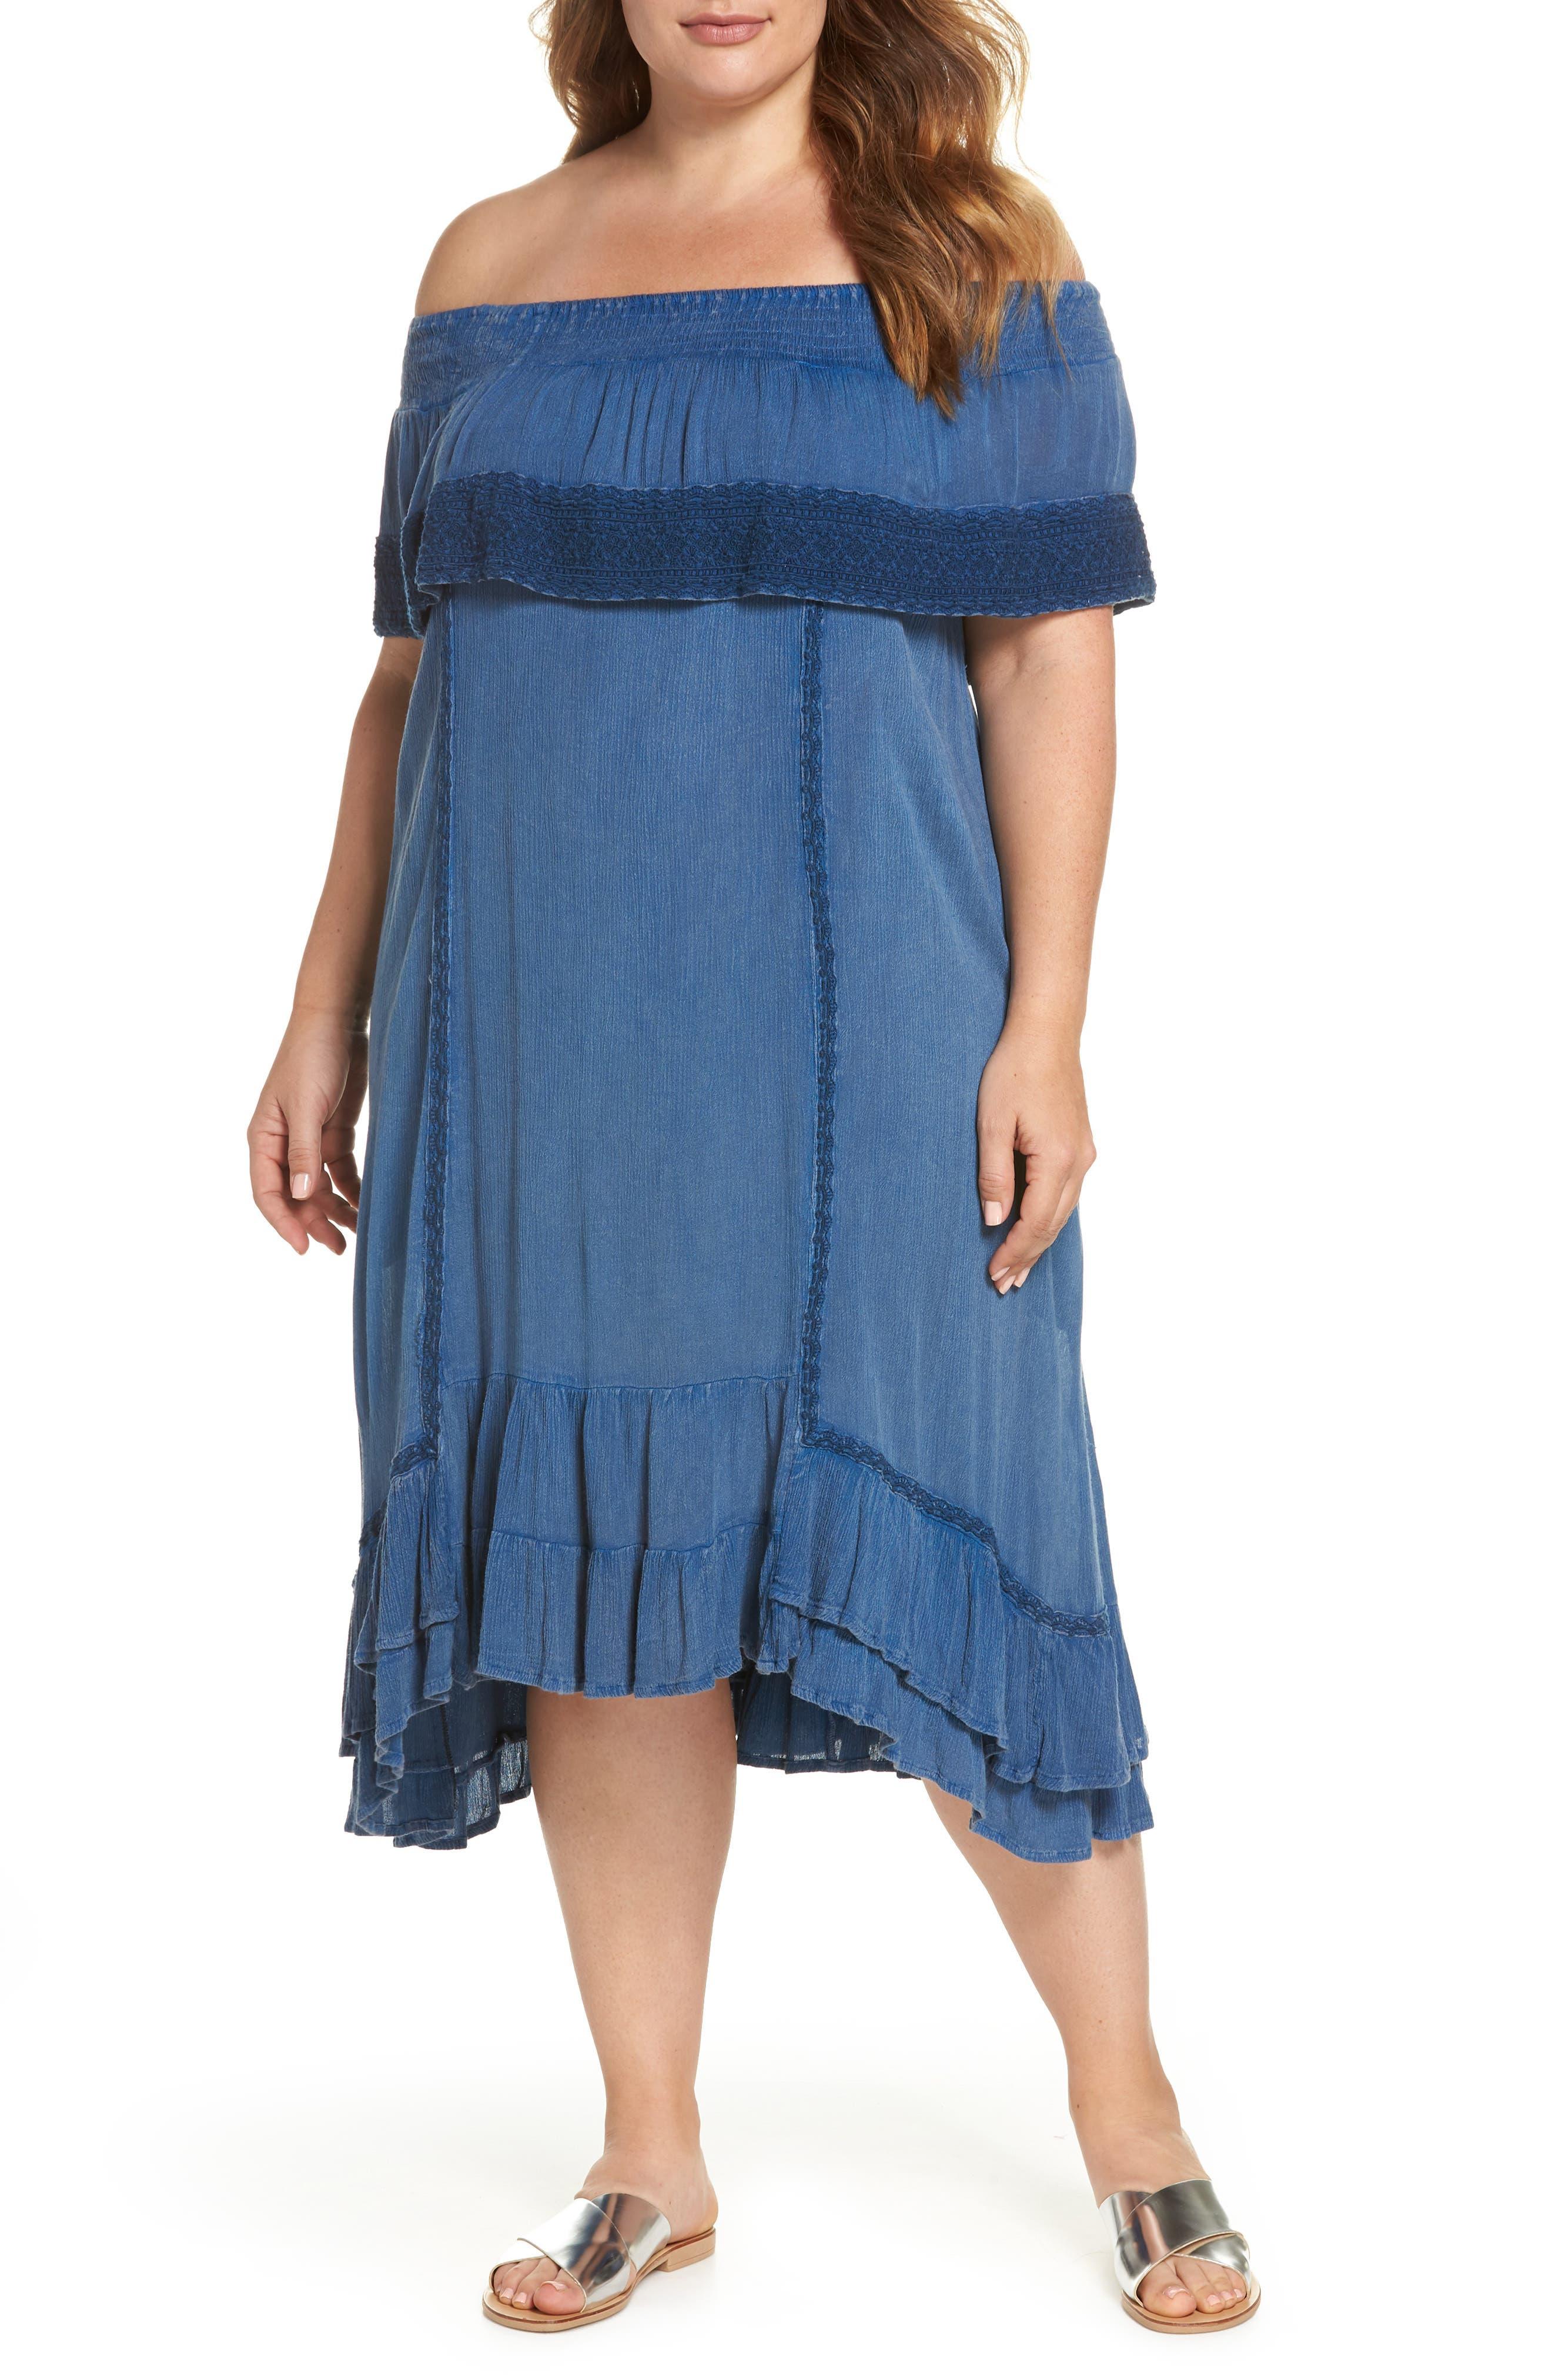 Gavin Ruffle Cover-Up Dress,                         Main,                         color, 462